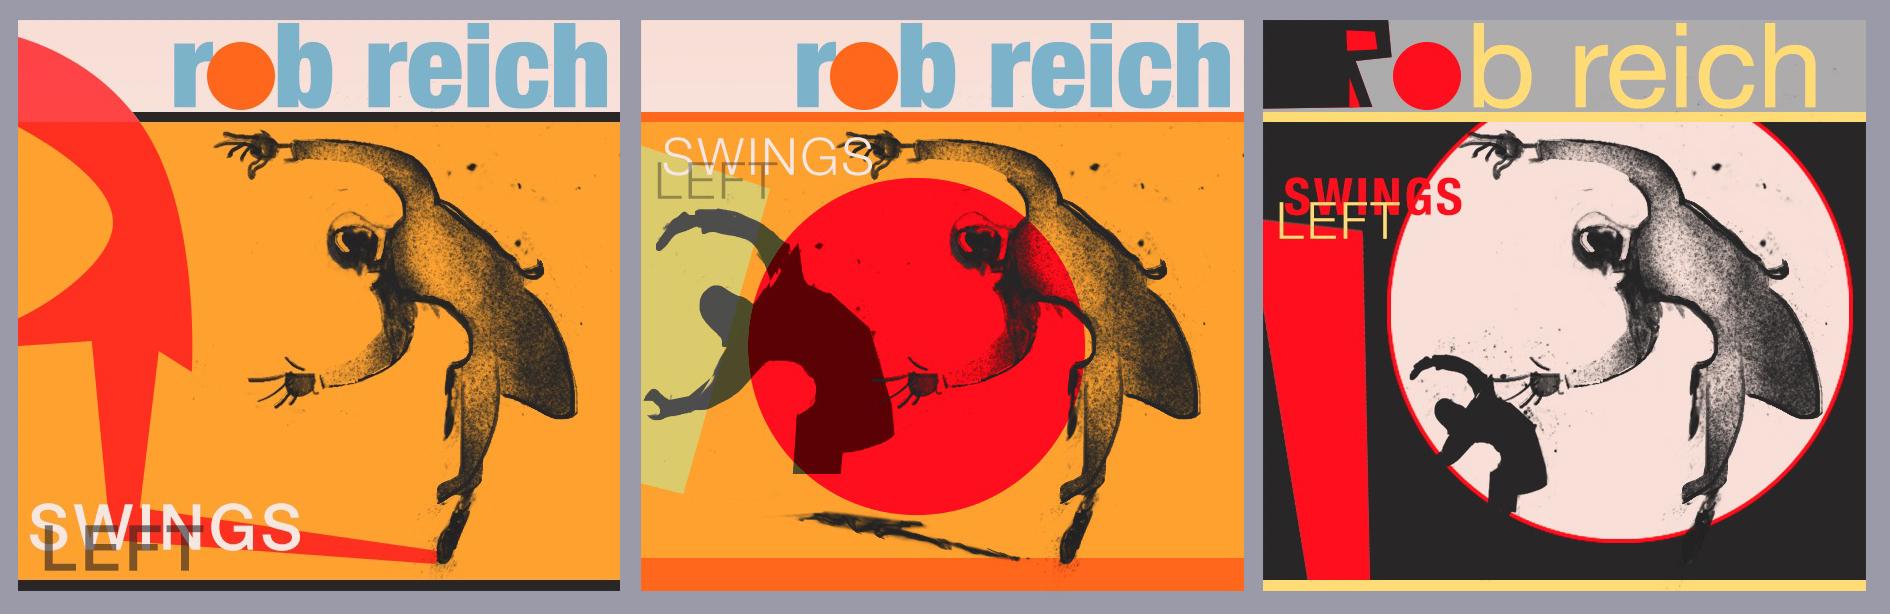 Rob Reich Album Cover Design Variations